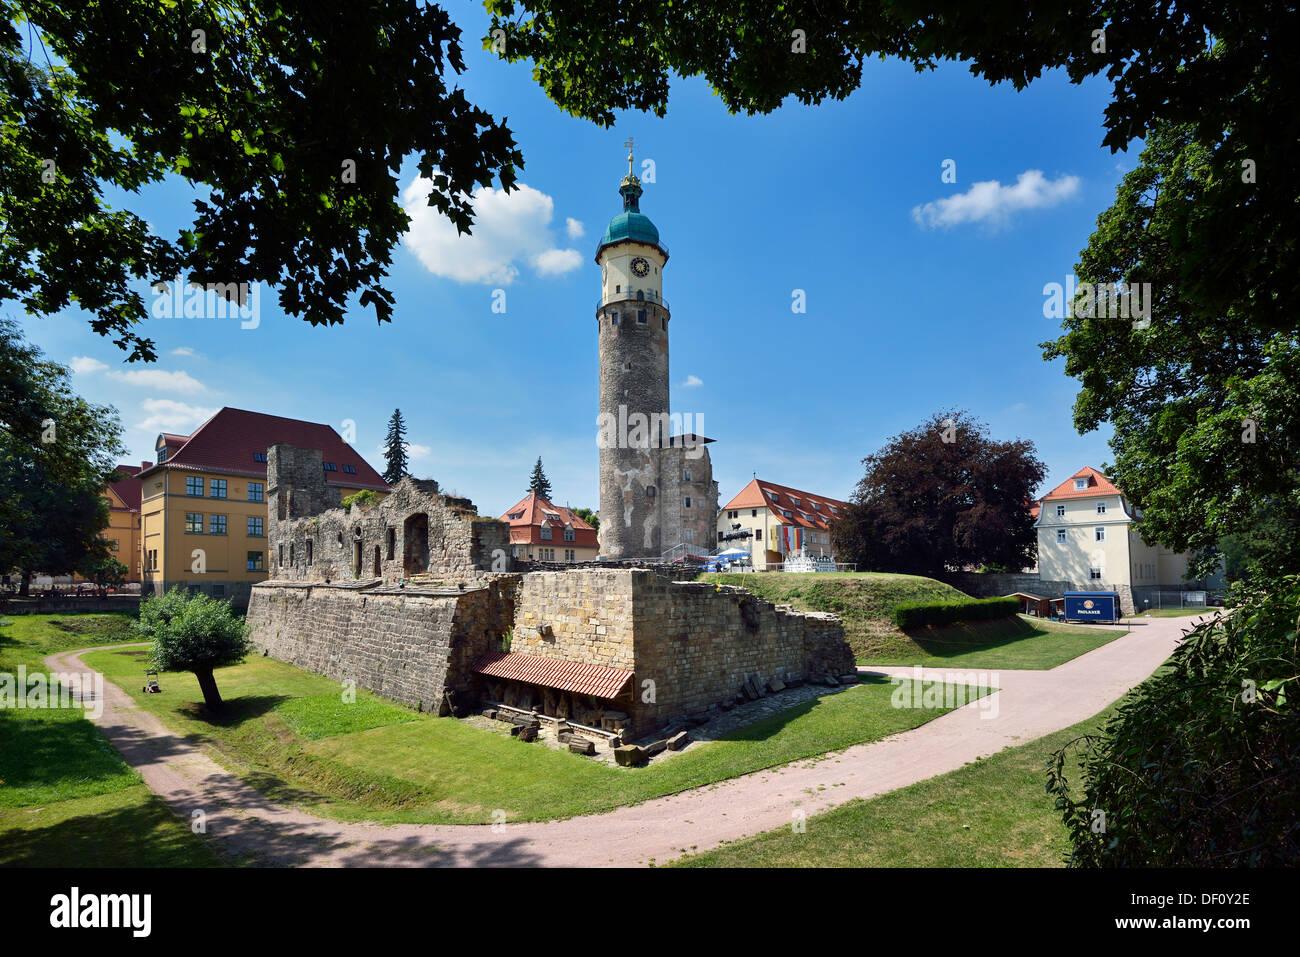 View point Envy corner tower on the area of the castle ruin, Thuringia, Arnstadt, Aussichtpunkt Neideckturm auf dem Areal der Sc - Stock Image